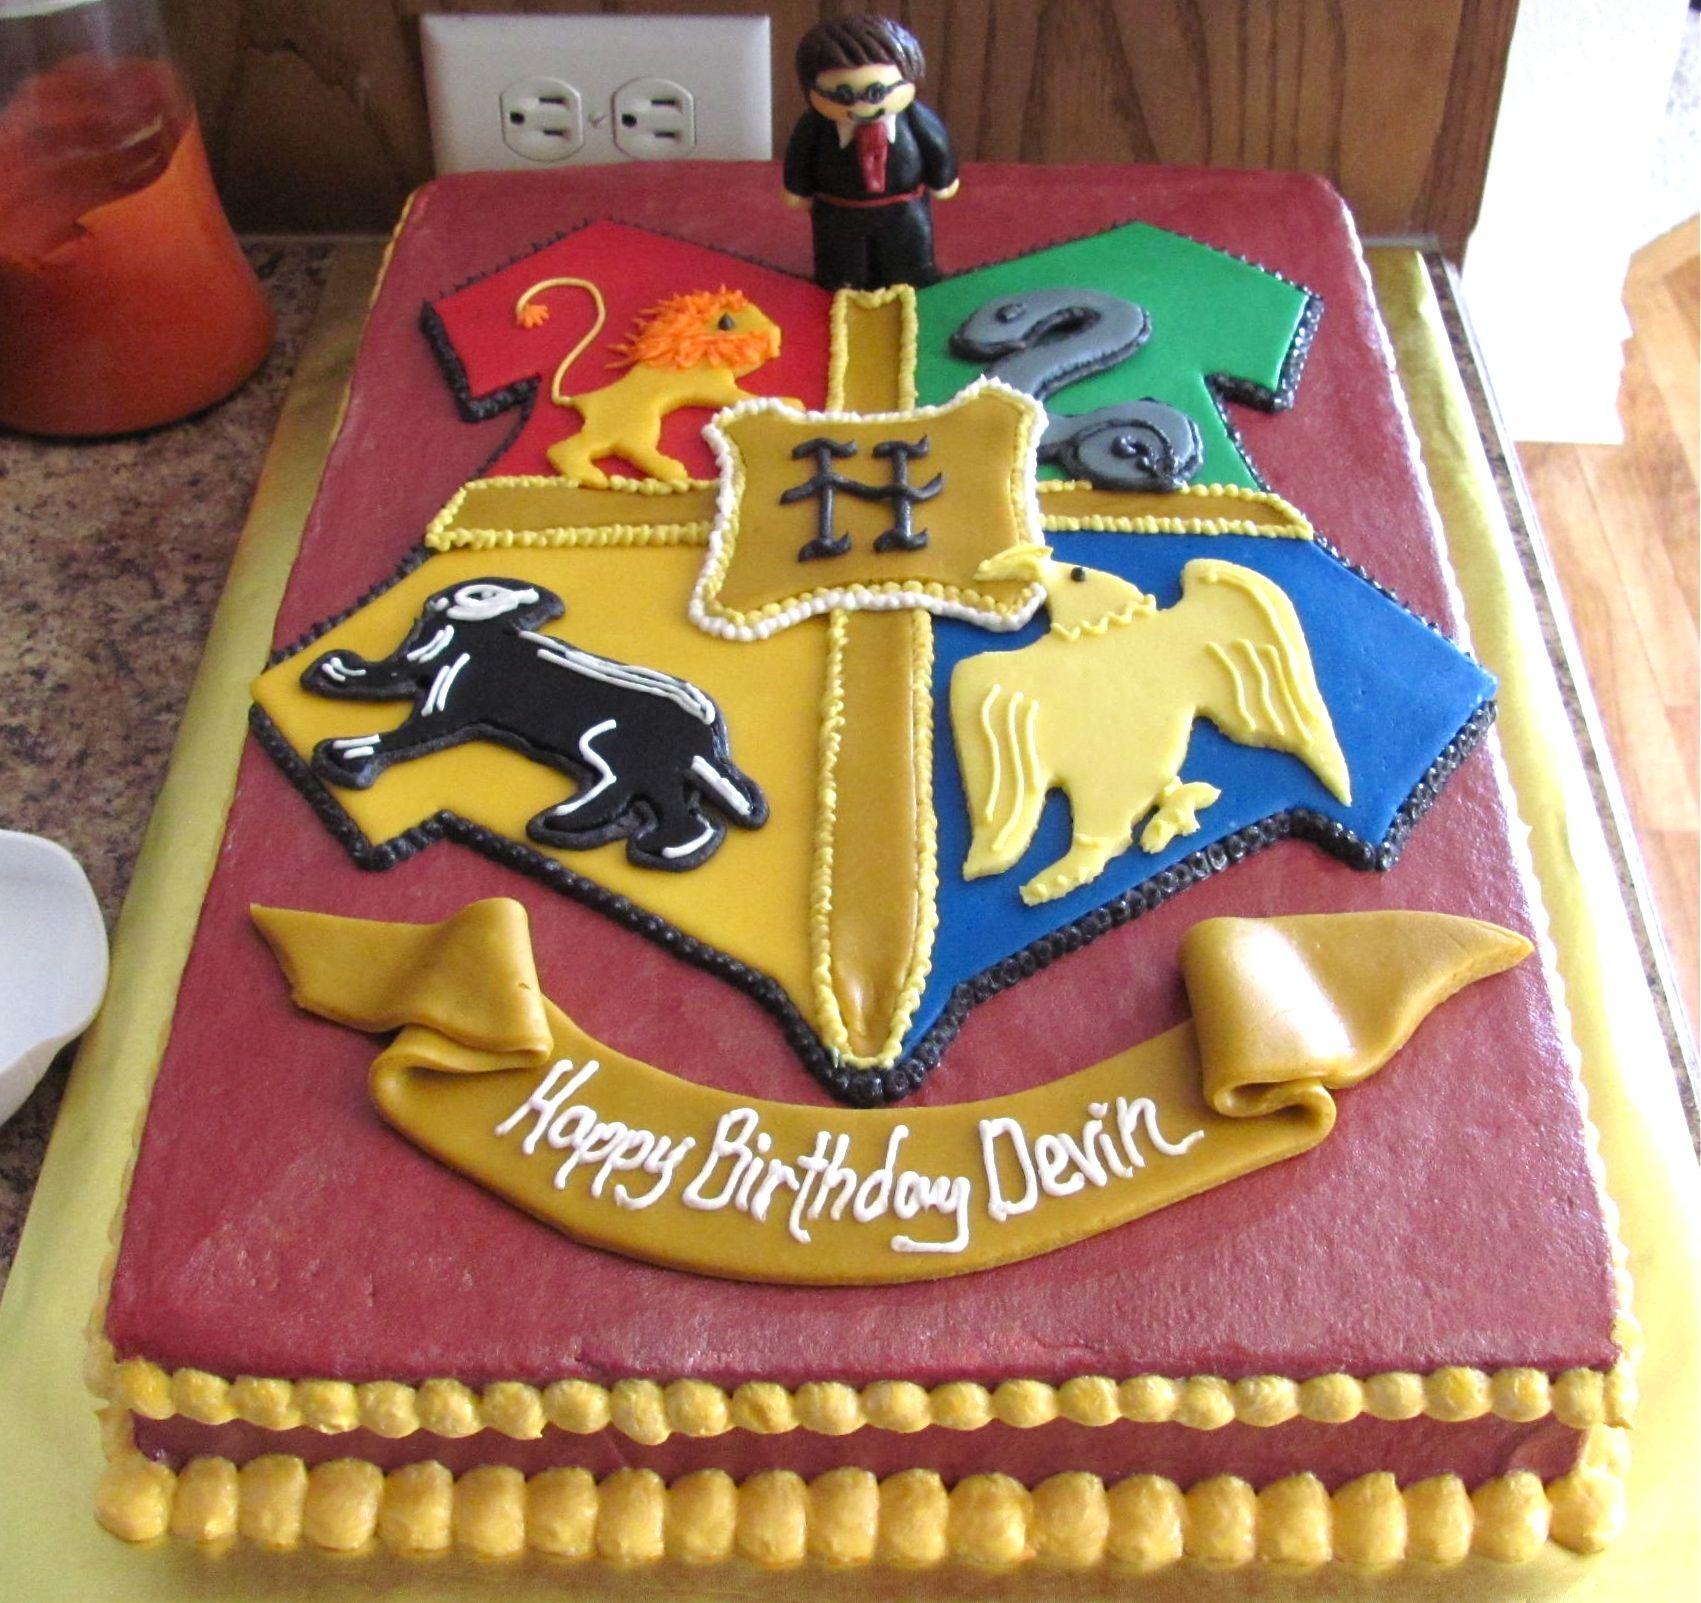 Harry Potter Cake Birthday Cakes Harry Potter Ricette Torta Di Harry Potter Torta A Tema Harry Potter